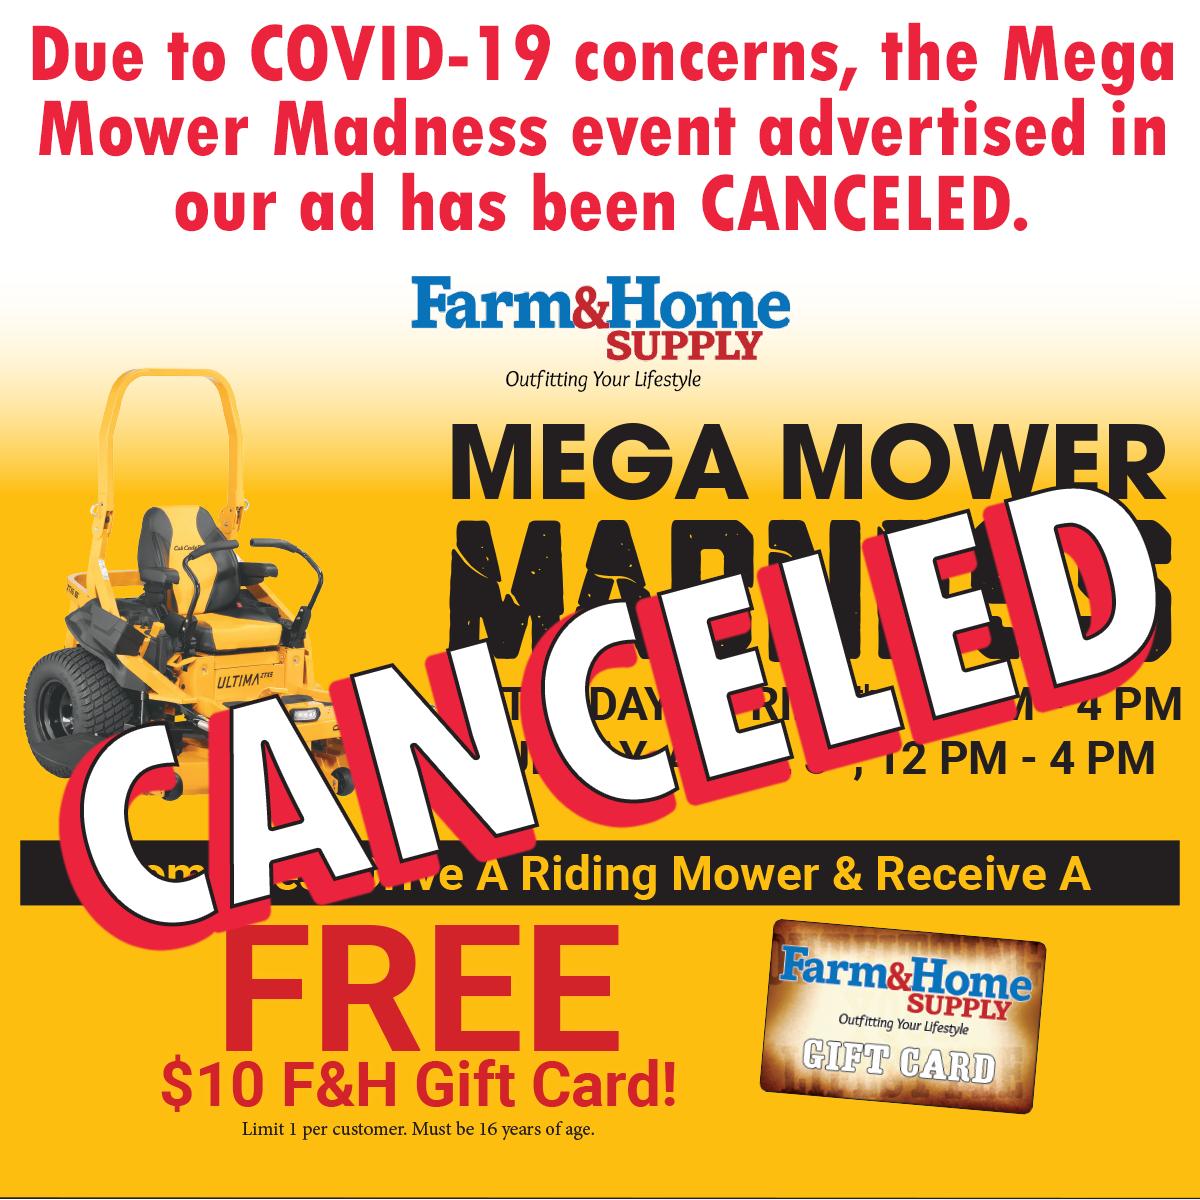 Mega Mower Madness Canceled